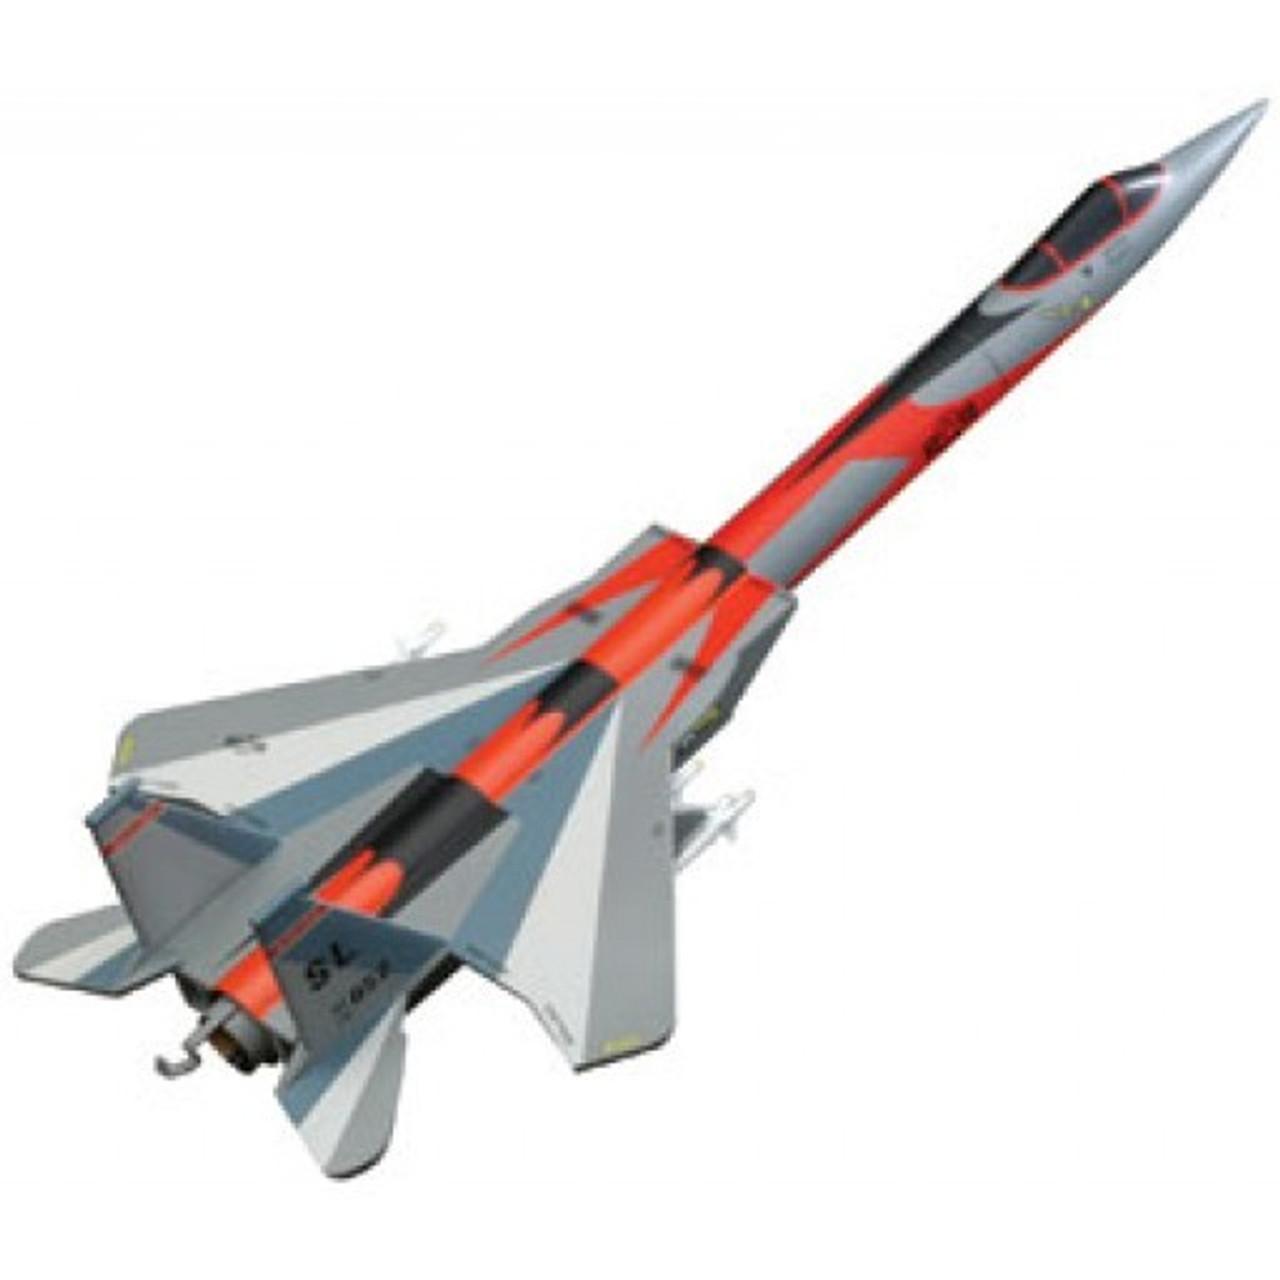 Estes Model Rockets - Skill Level 2 Kits